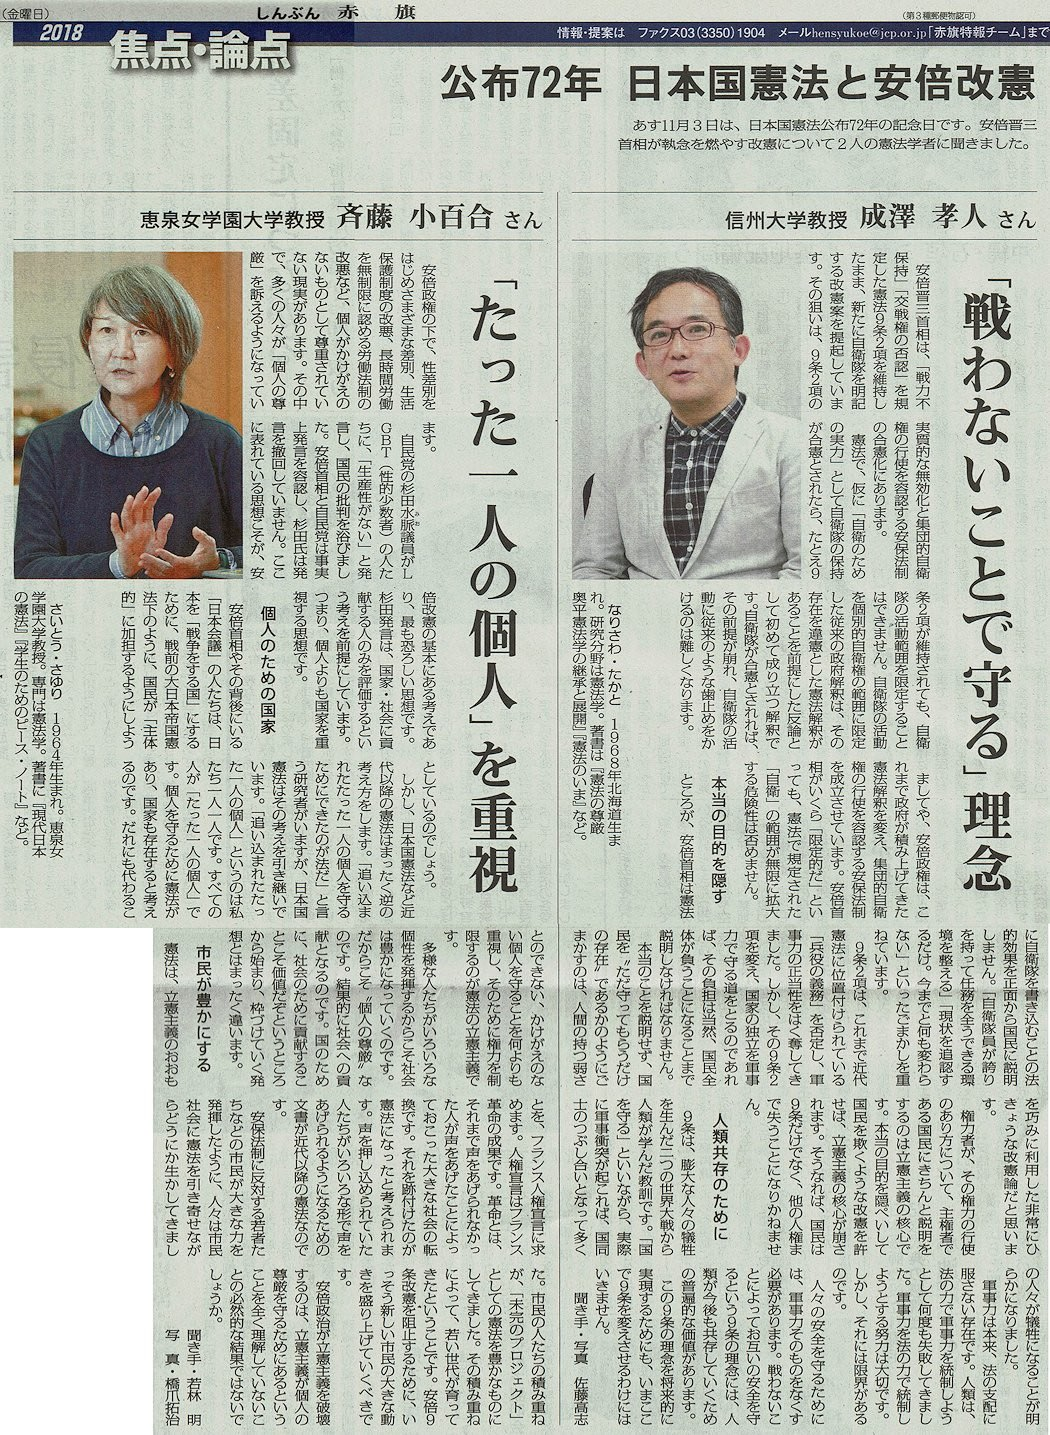 akahata 公布72年 日本国憲法と安倍改憲/「戦わないことで守る」理念 ...